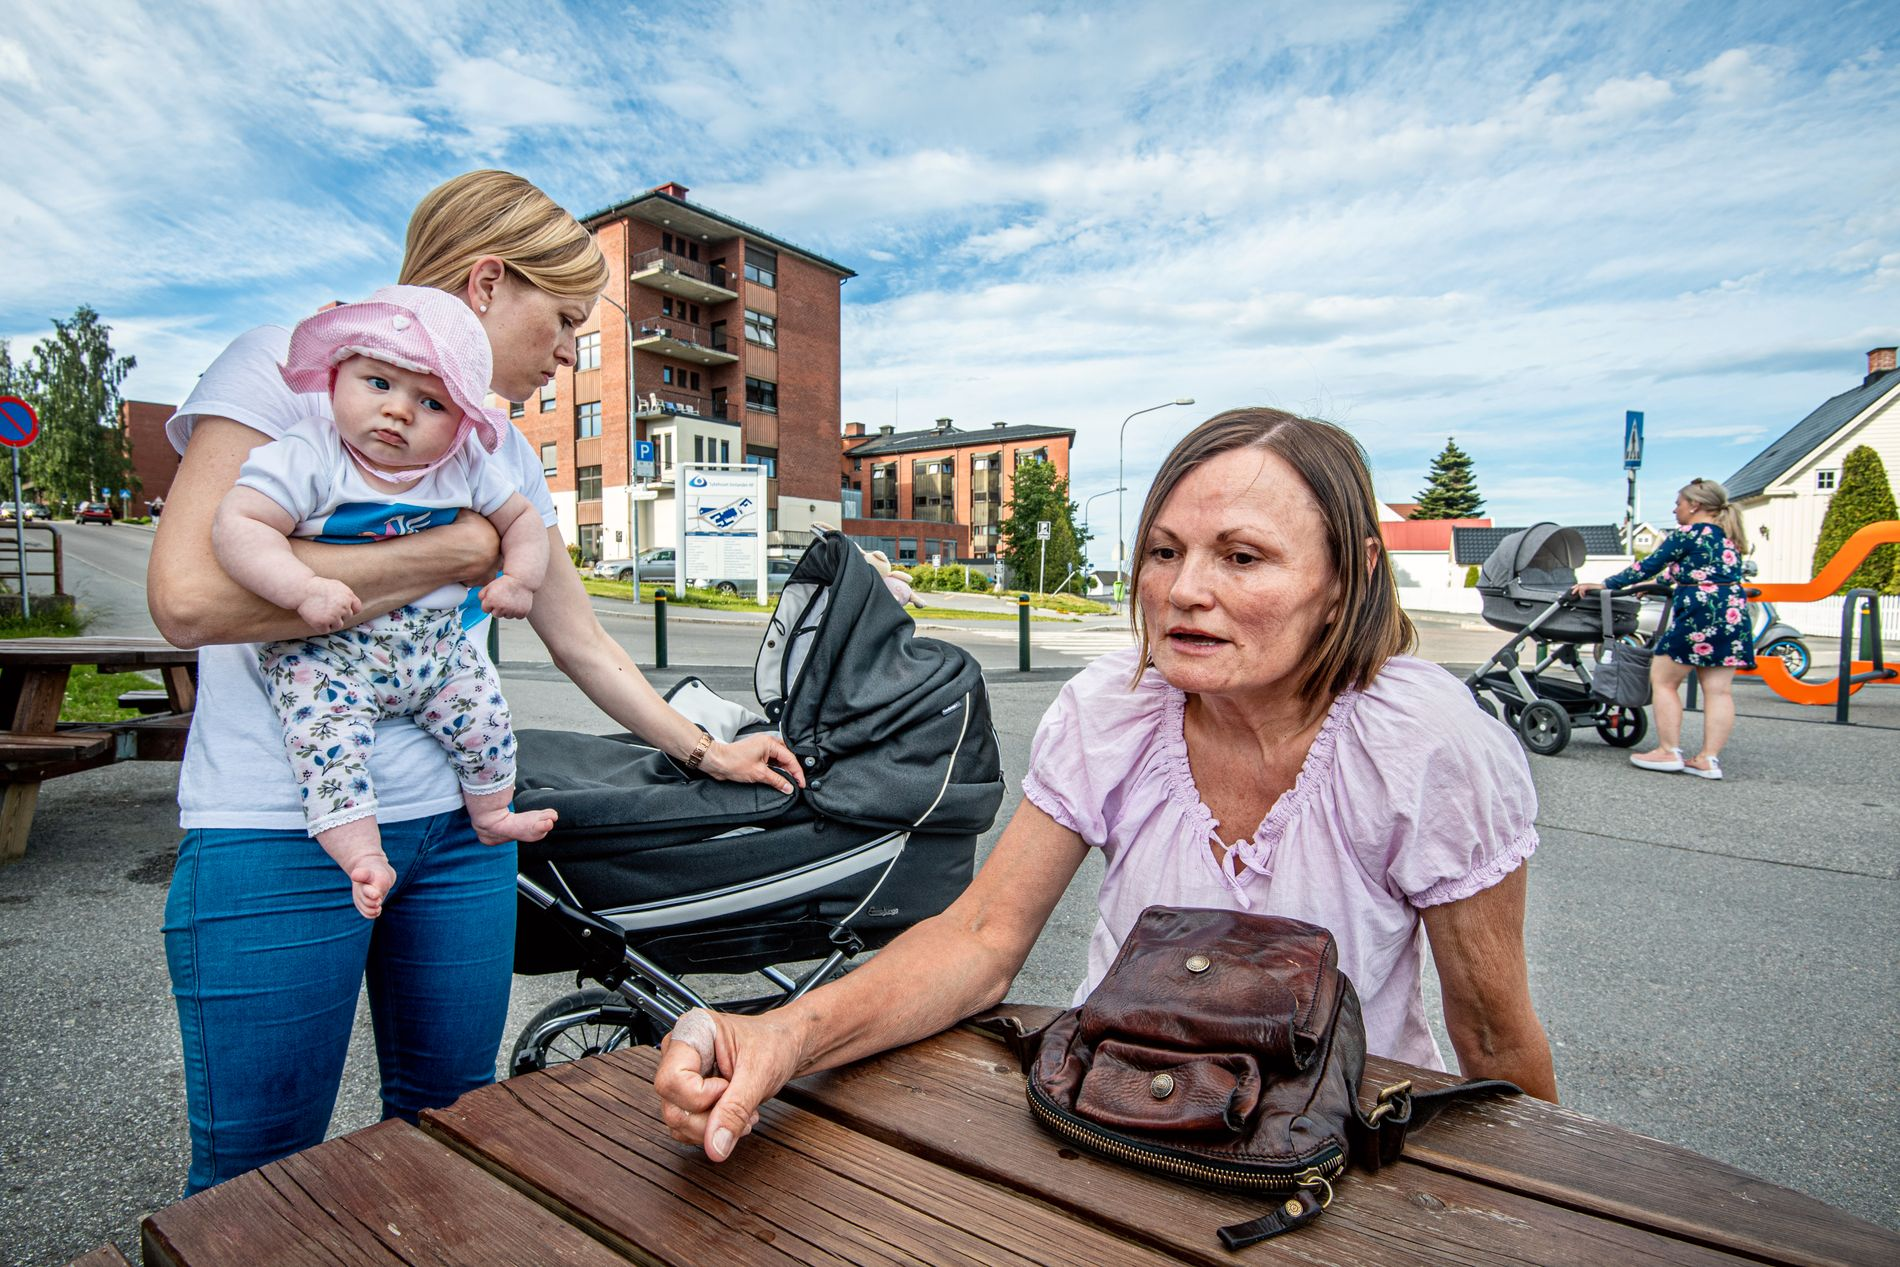 ENGASJERTE: Marianne Sundlisæter Skinner har solidaritet med andre fødende og de ansatte på fødeavdelingen. Her med datteren Evie (4 måneder) på armen og jordmor Karen Marie Jacobsen.